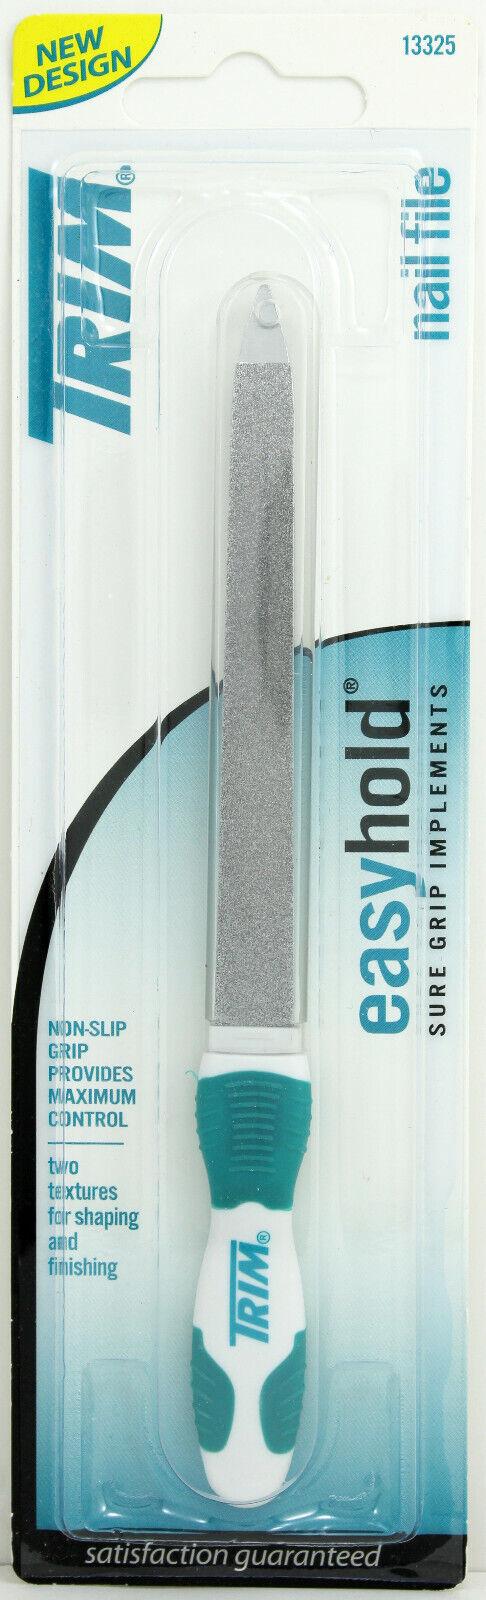 Trim Nail File w/ Easyhold Grip